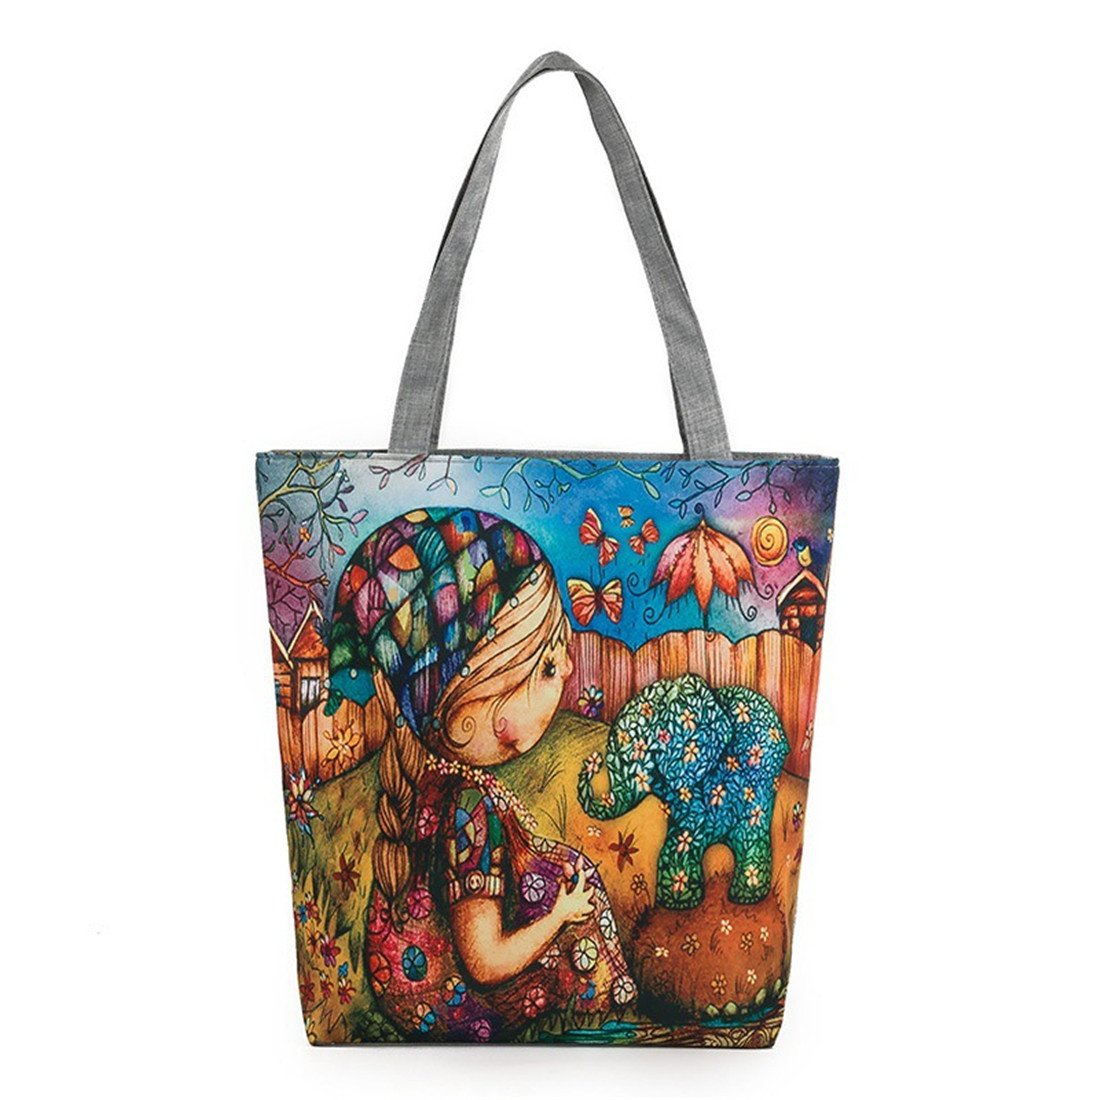 Luckywe Stylish Crossbody Messenger Classic Business Shoulder Bag Canvas Painting Cartoon Zipper A17 Multicolor2